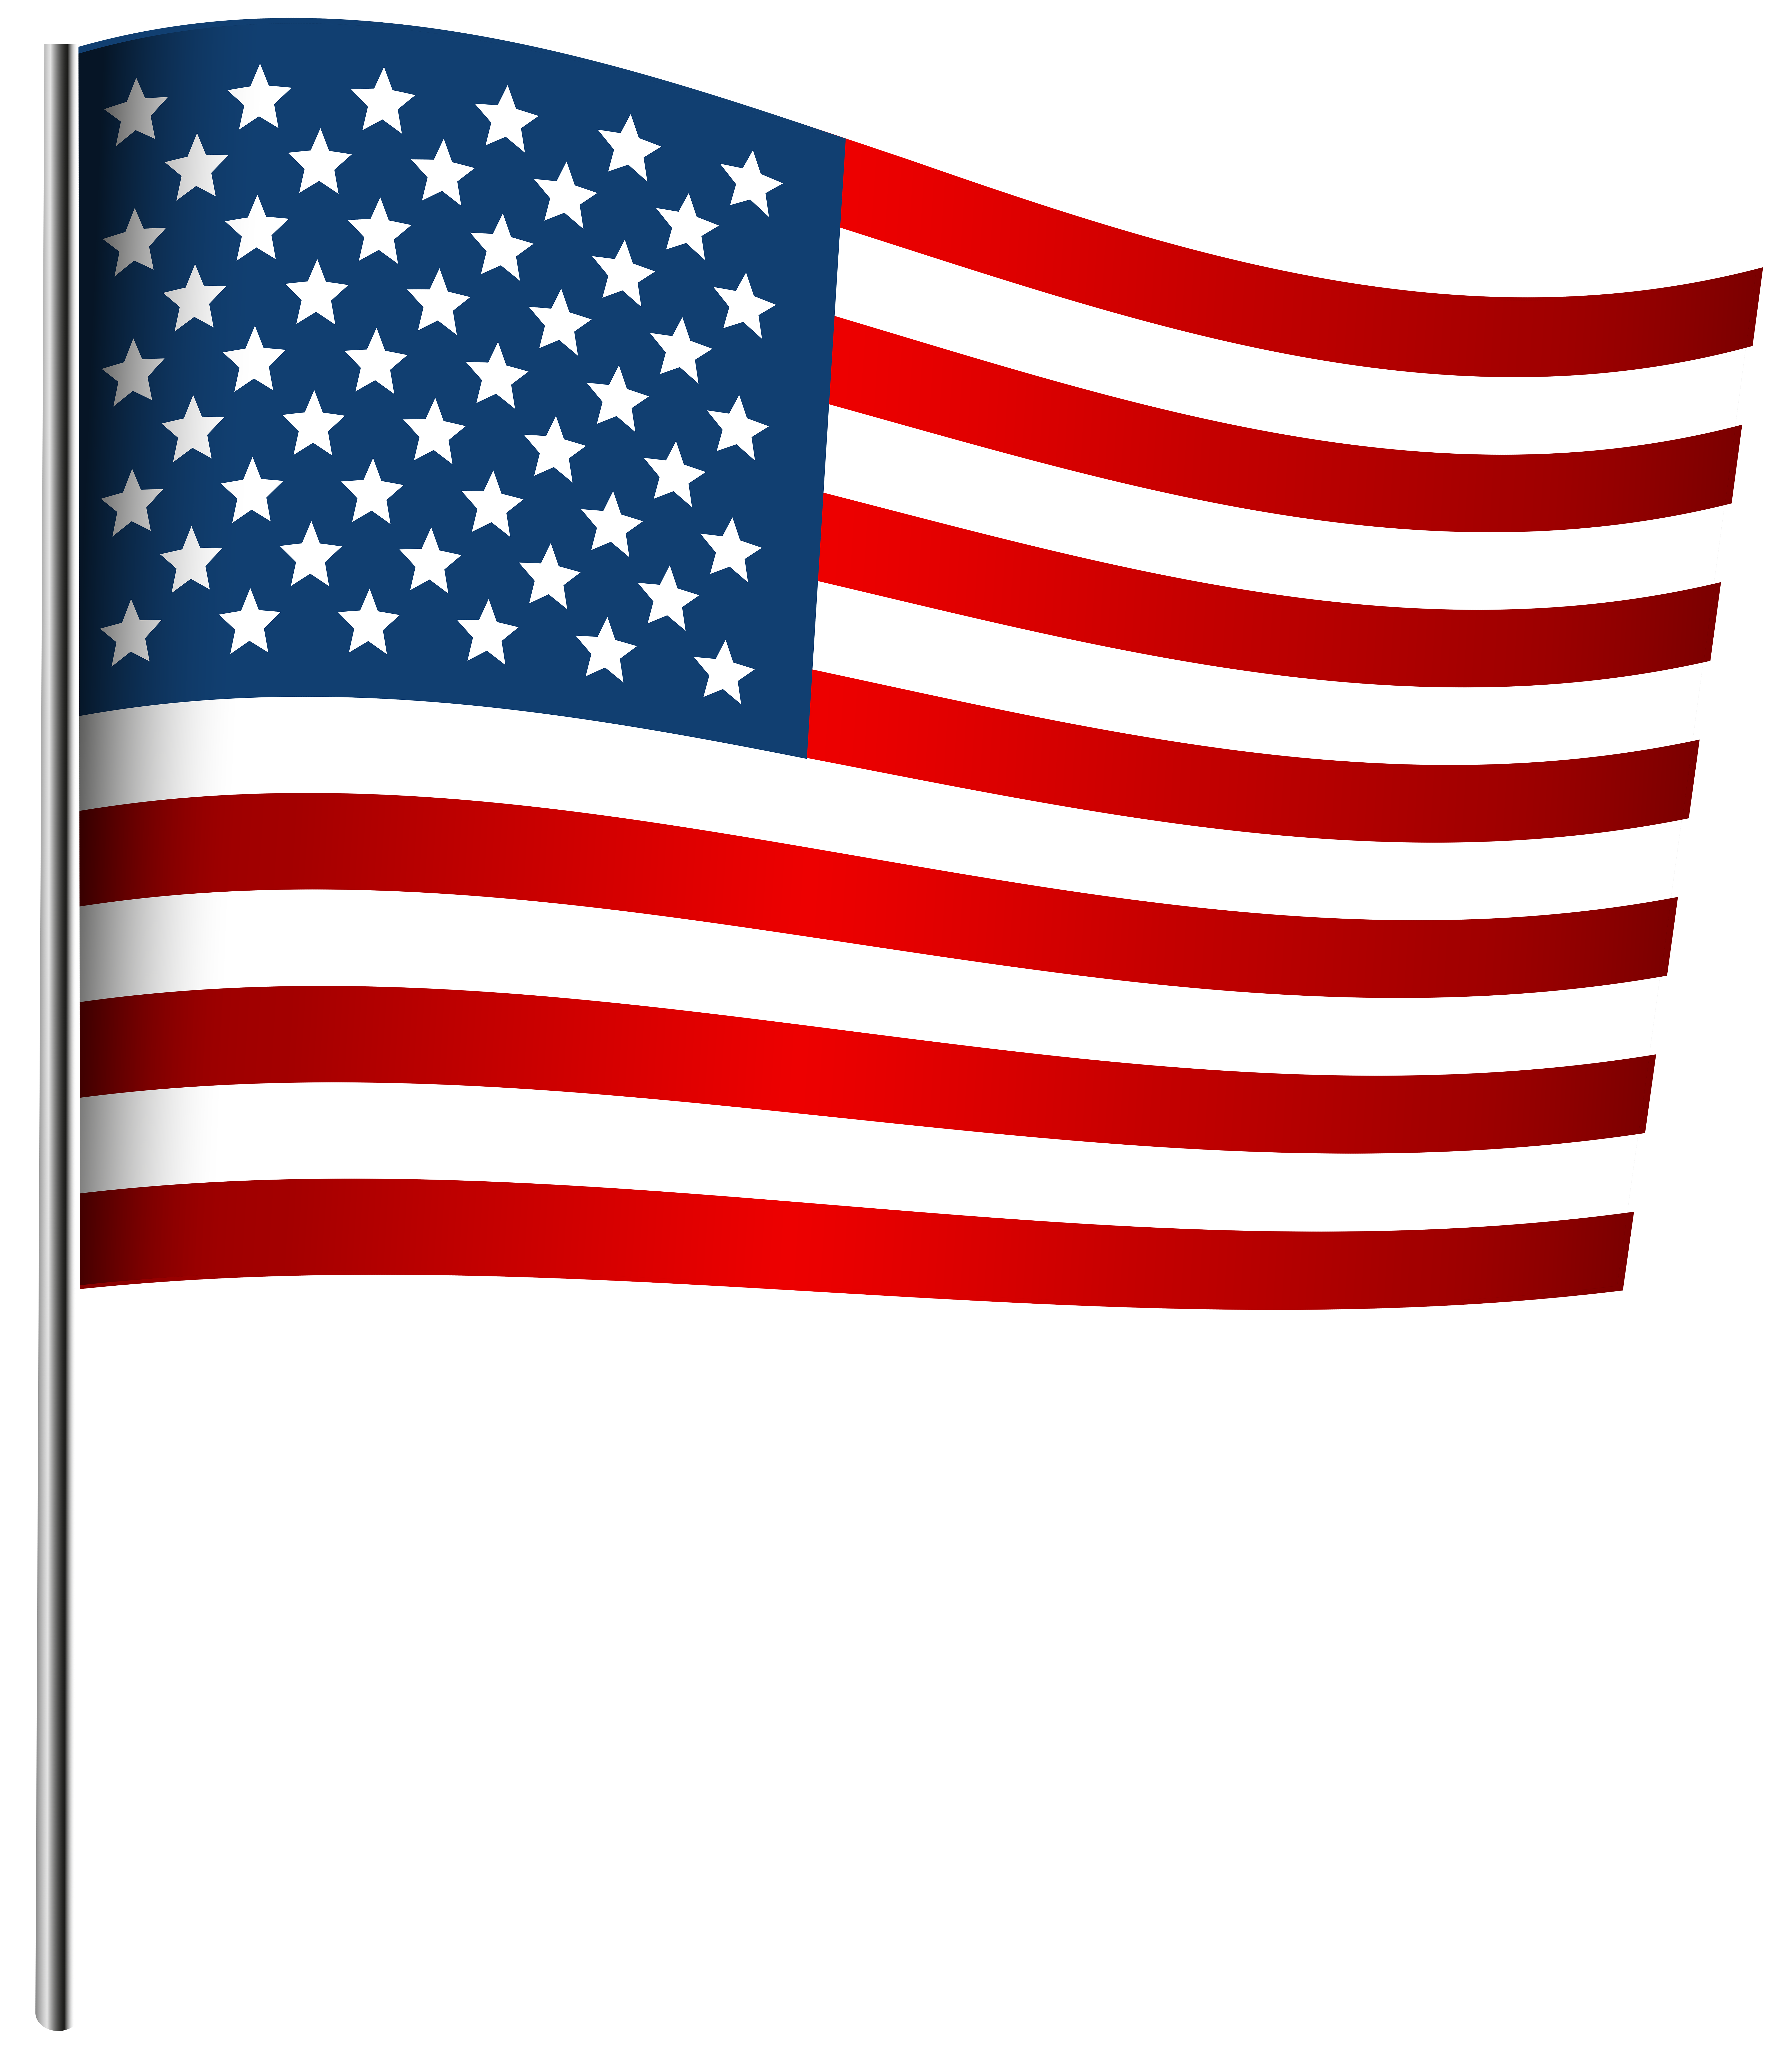 American Waving Flag PNG Clip Art Image.